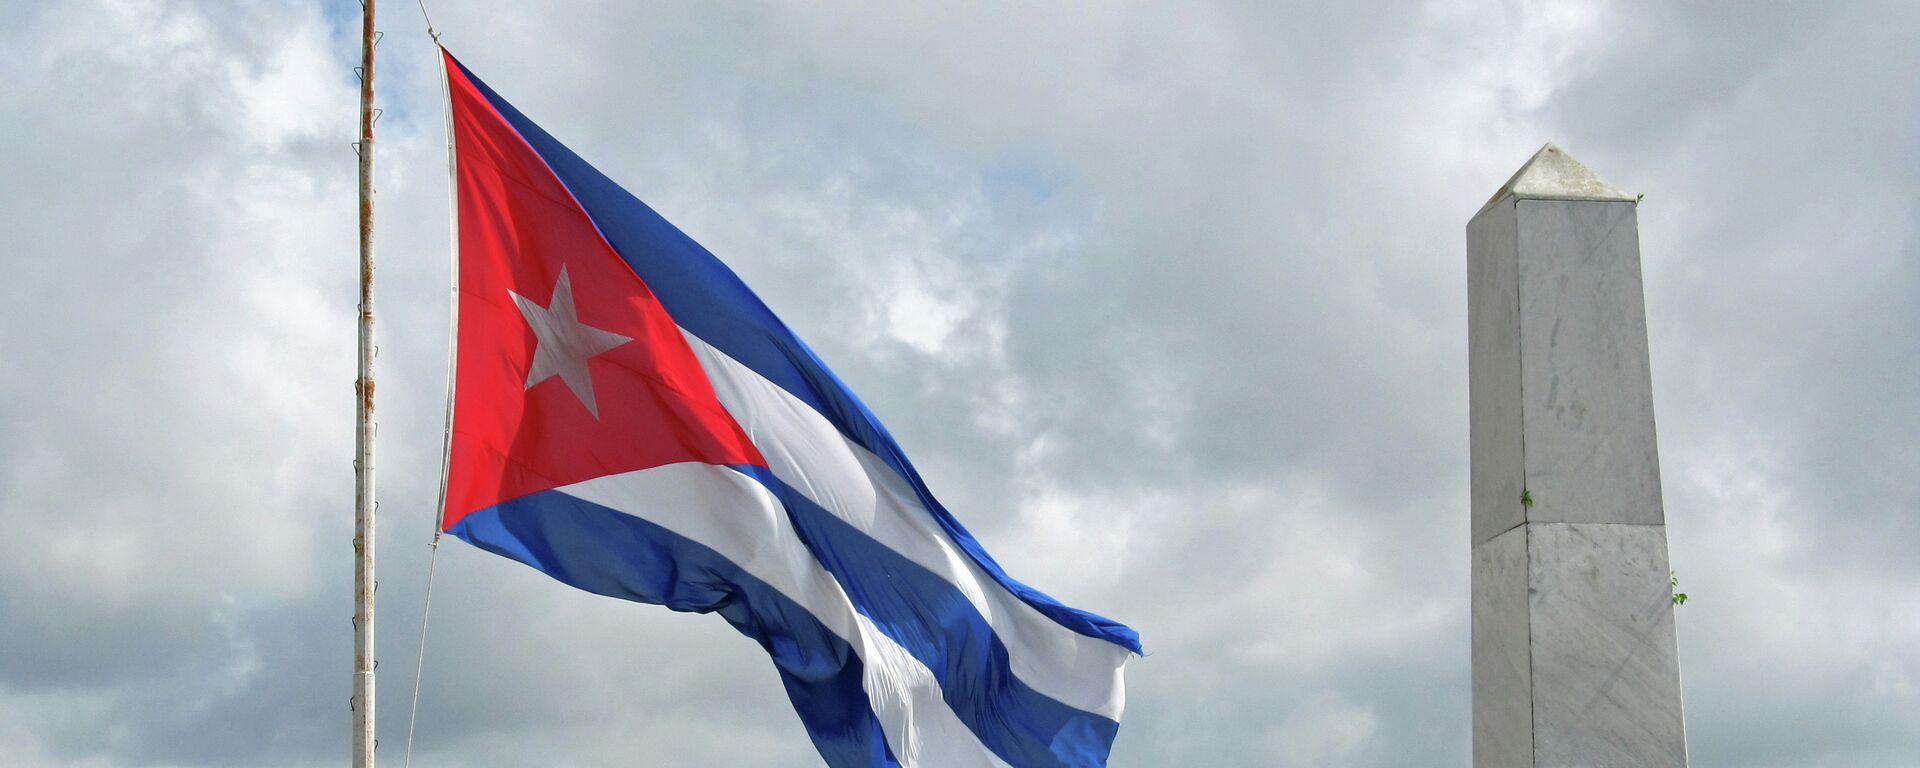 Bandera de Cuba - Sputnik Mundo, 1920, 09.04.2021